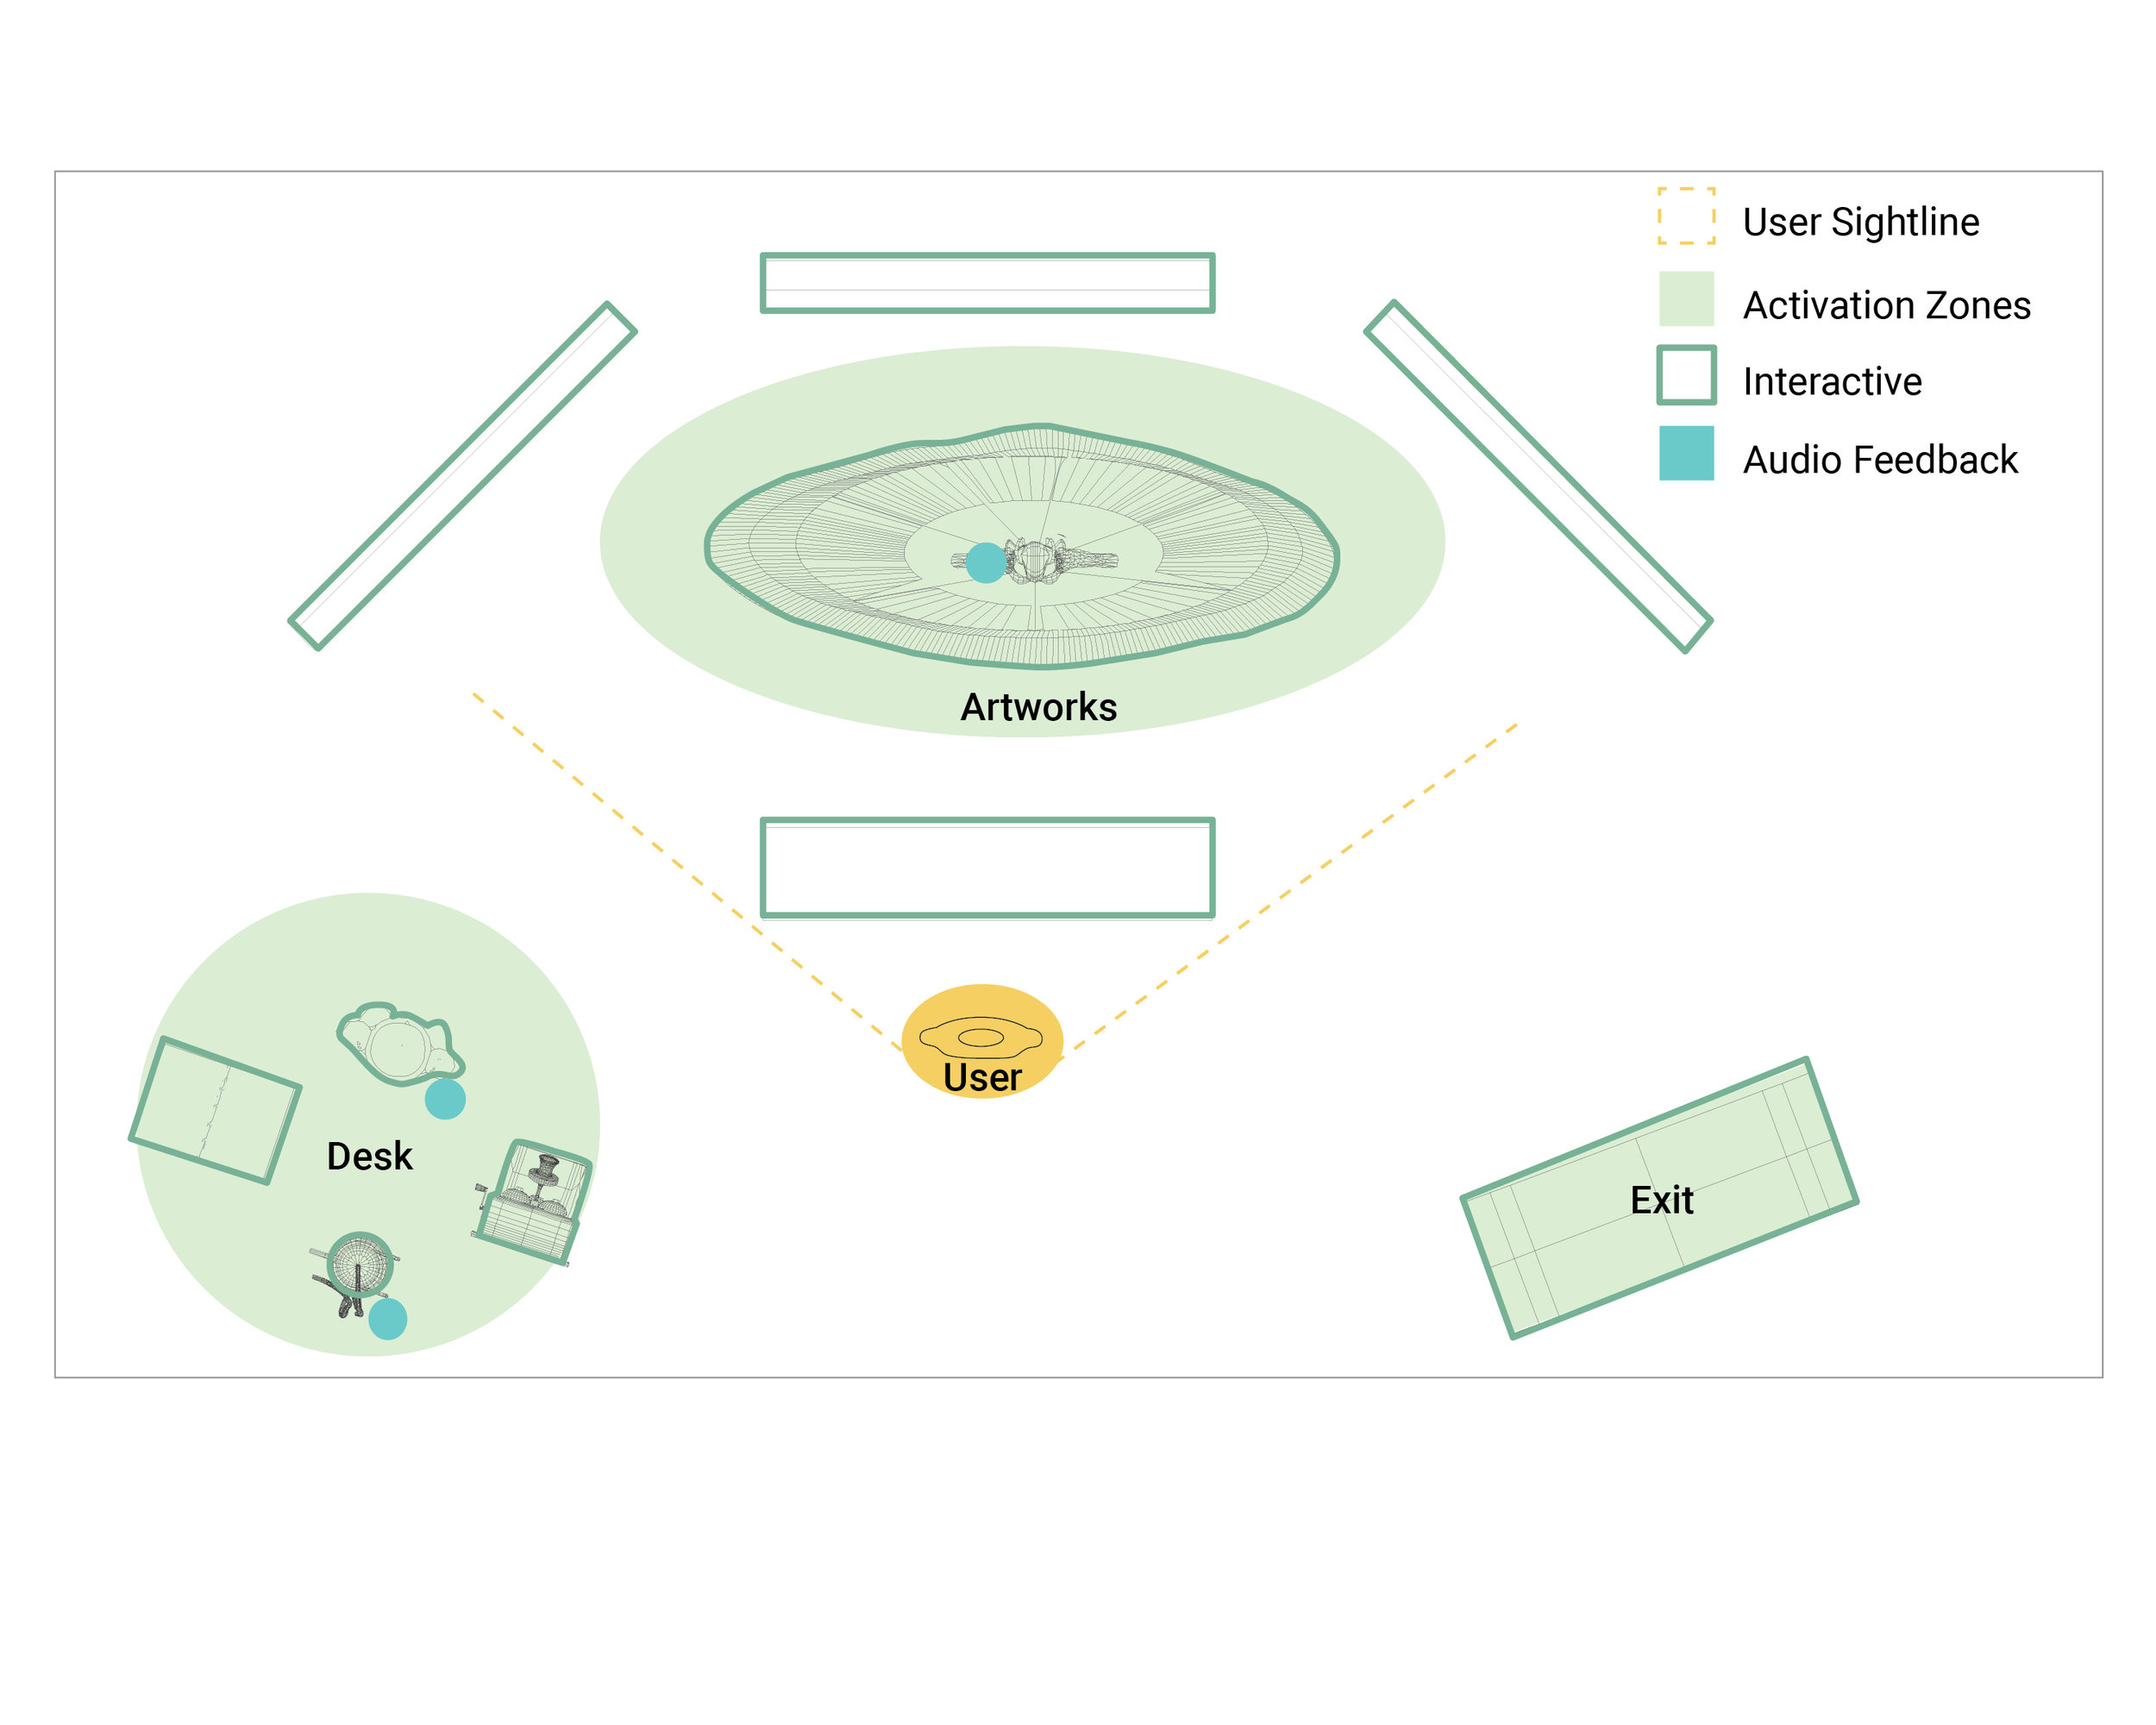 MR Assessment Diagrams5.jpg